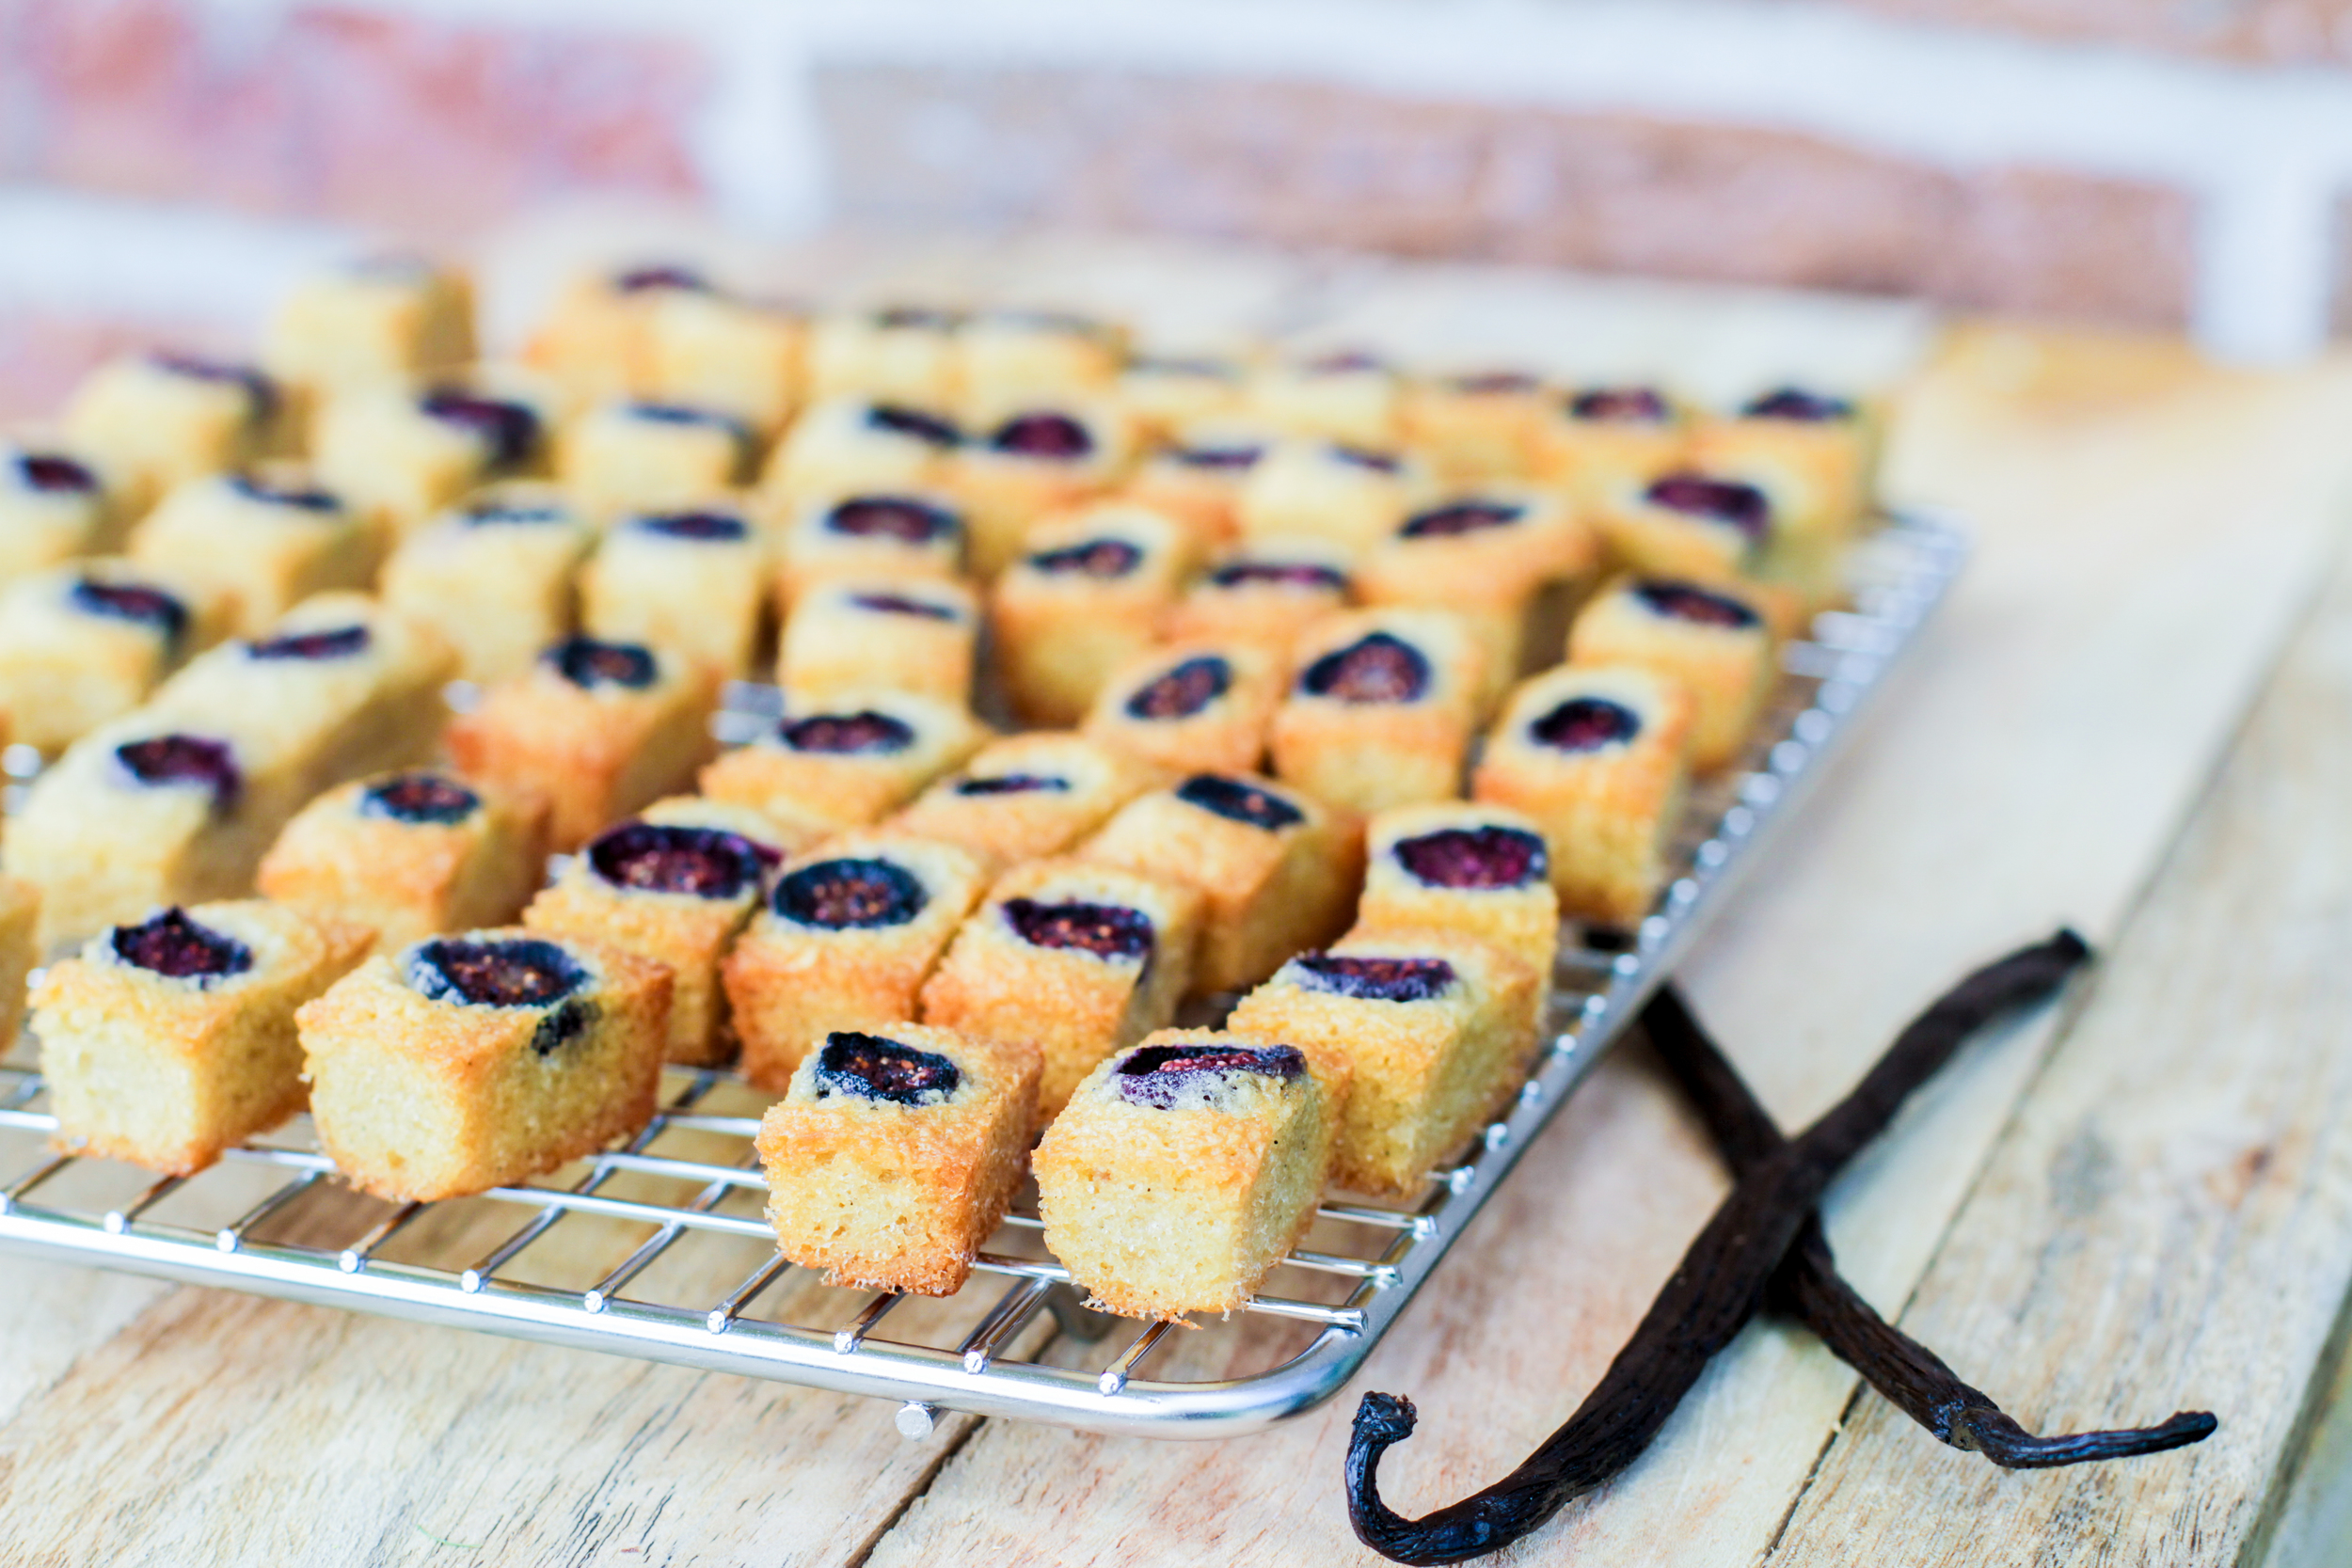 Blueberry & Vanilla Financiers